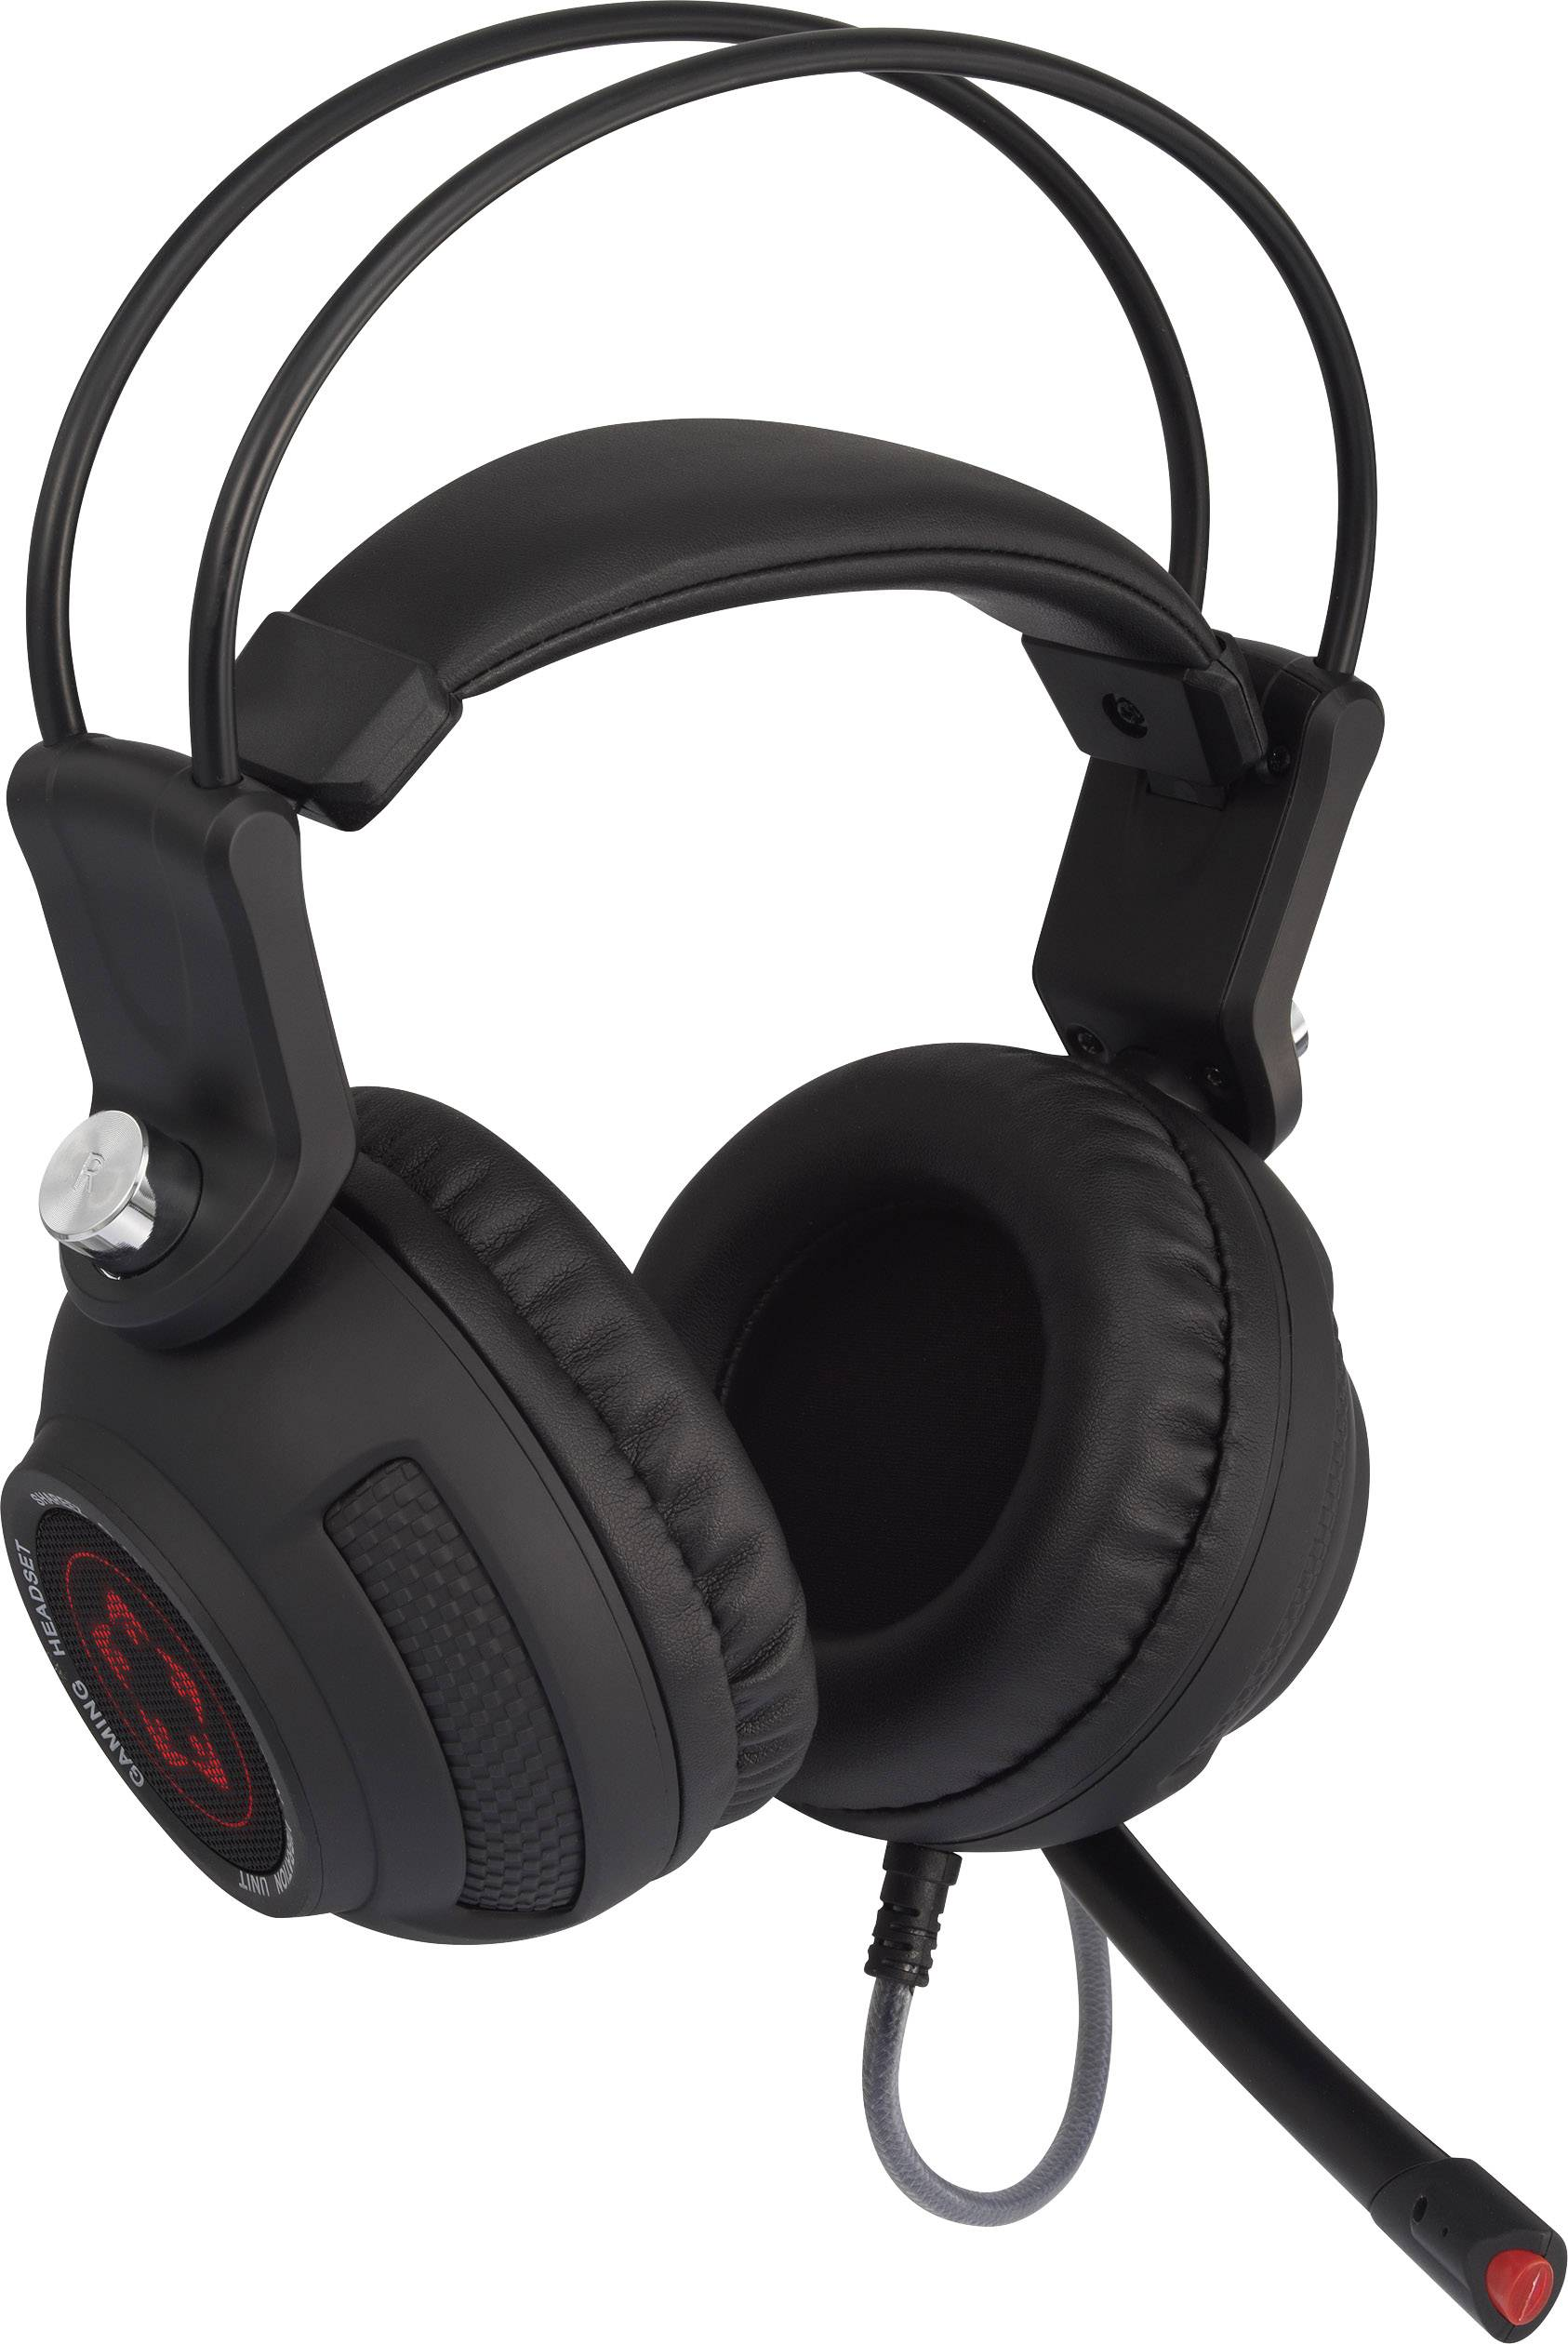 Logitech Gaming G633 Artemis Spectrum Gaming headset USB, 3 5 mm